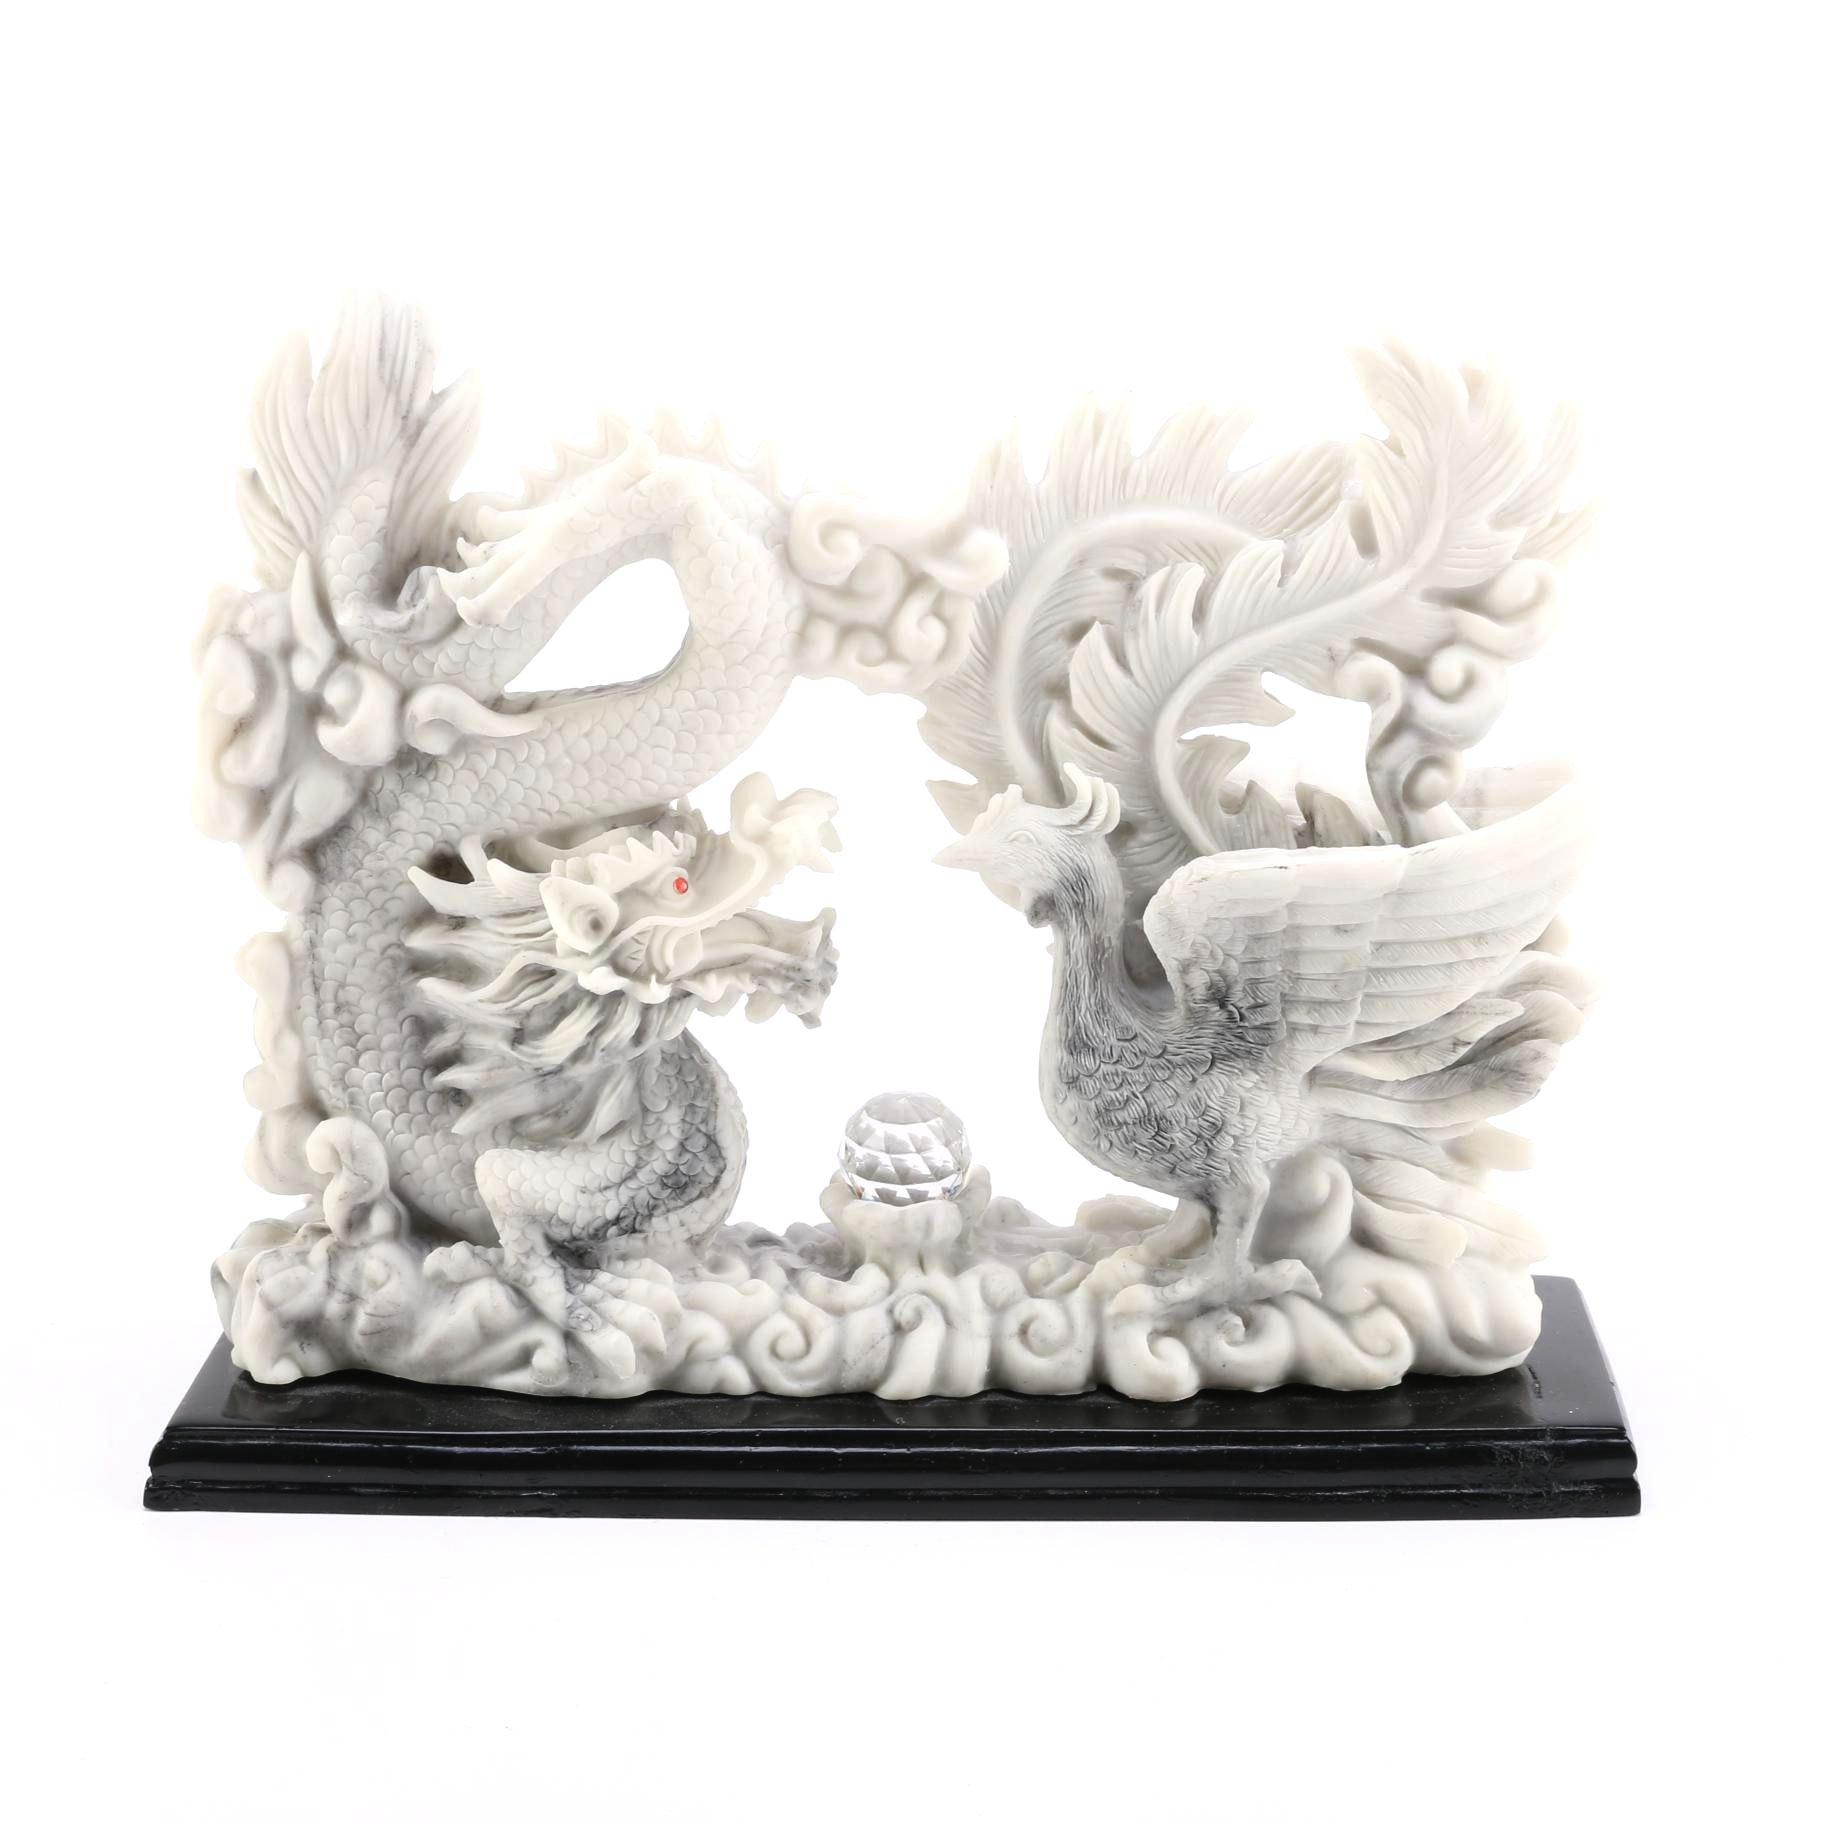 Dragon and Phoenix Sculpture